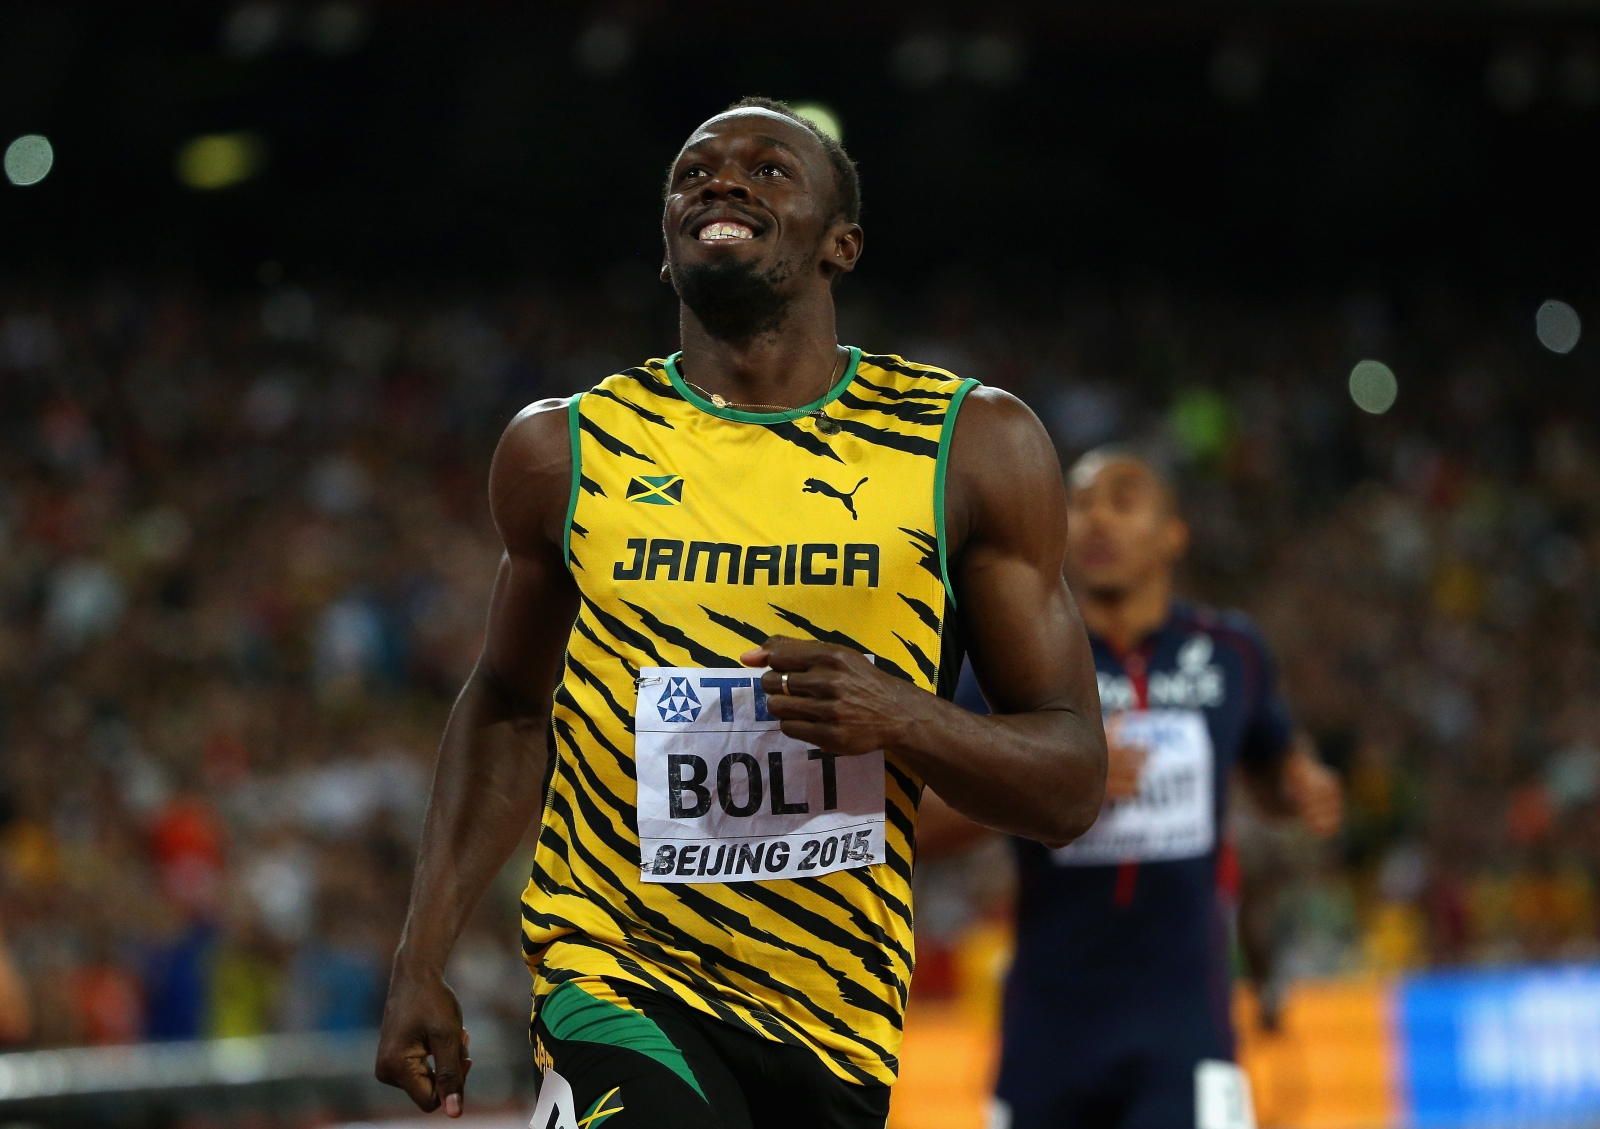 World Athletics Championships 2015: Usain Bolt wins gold ...